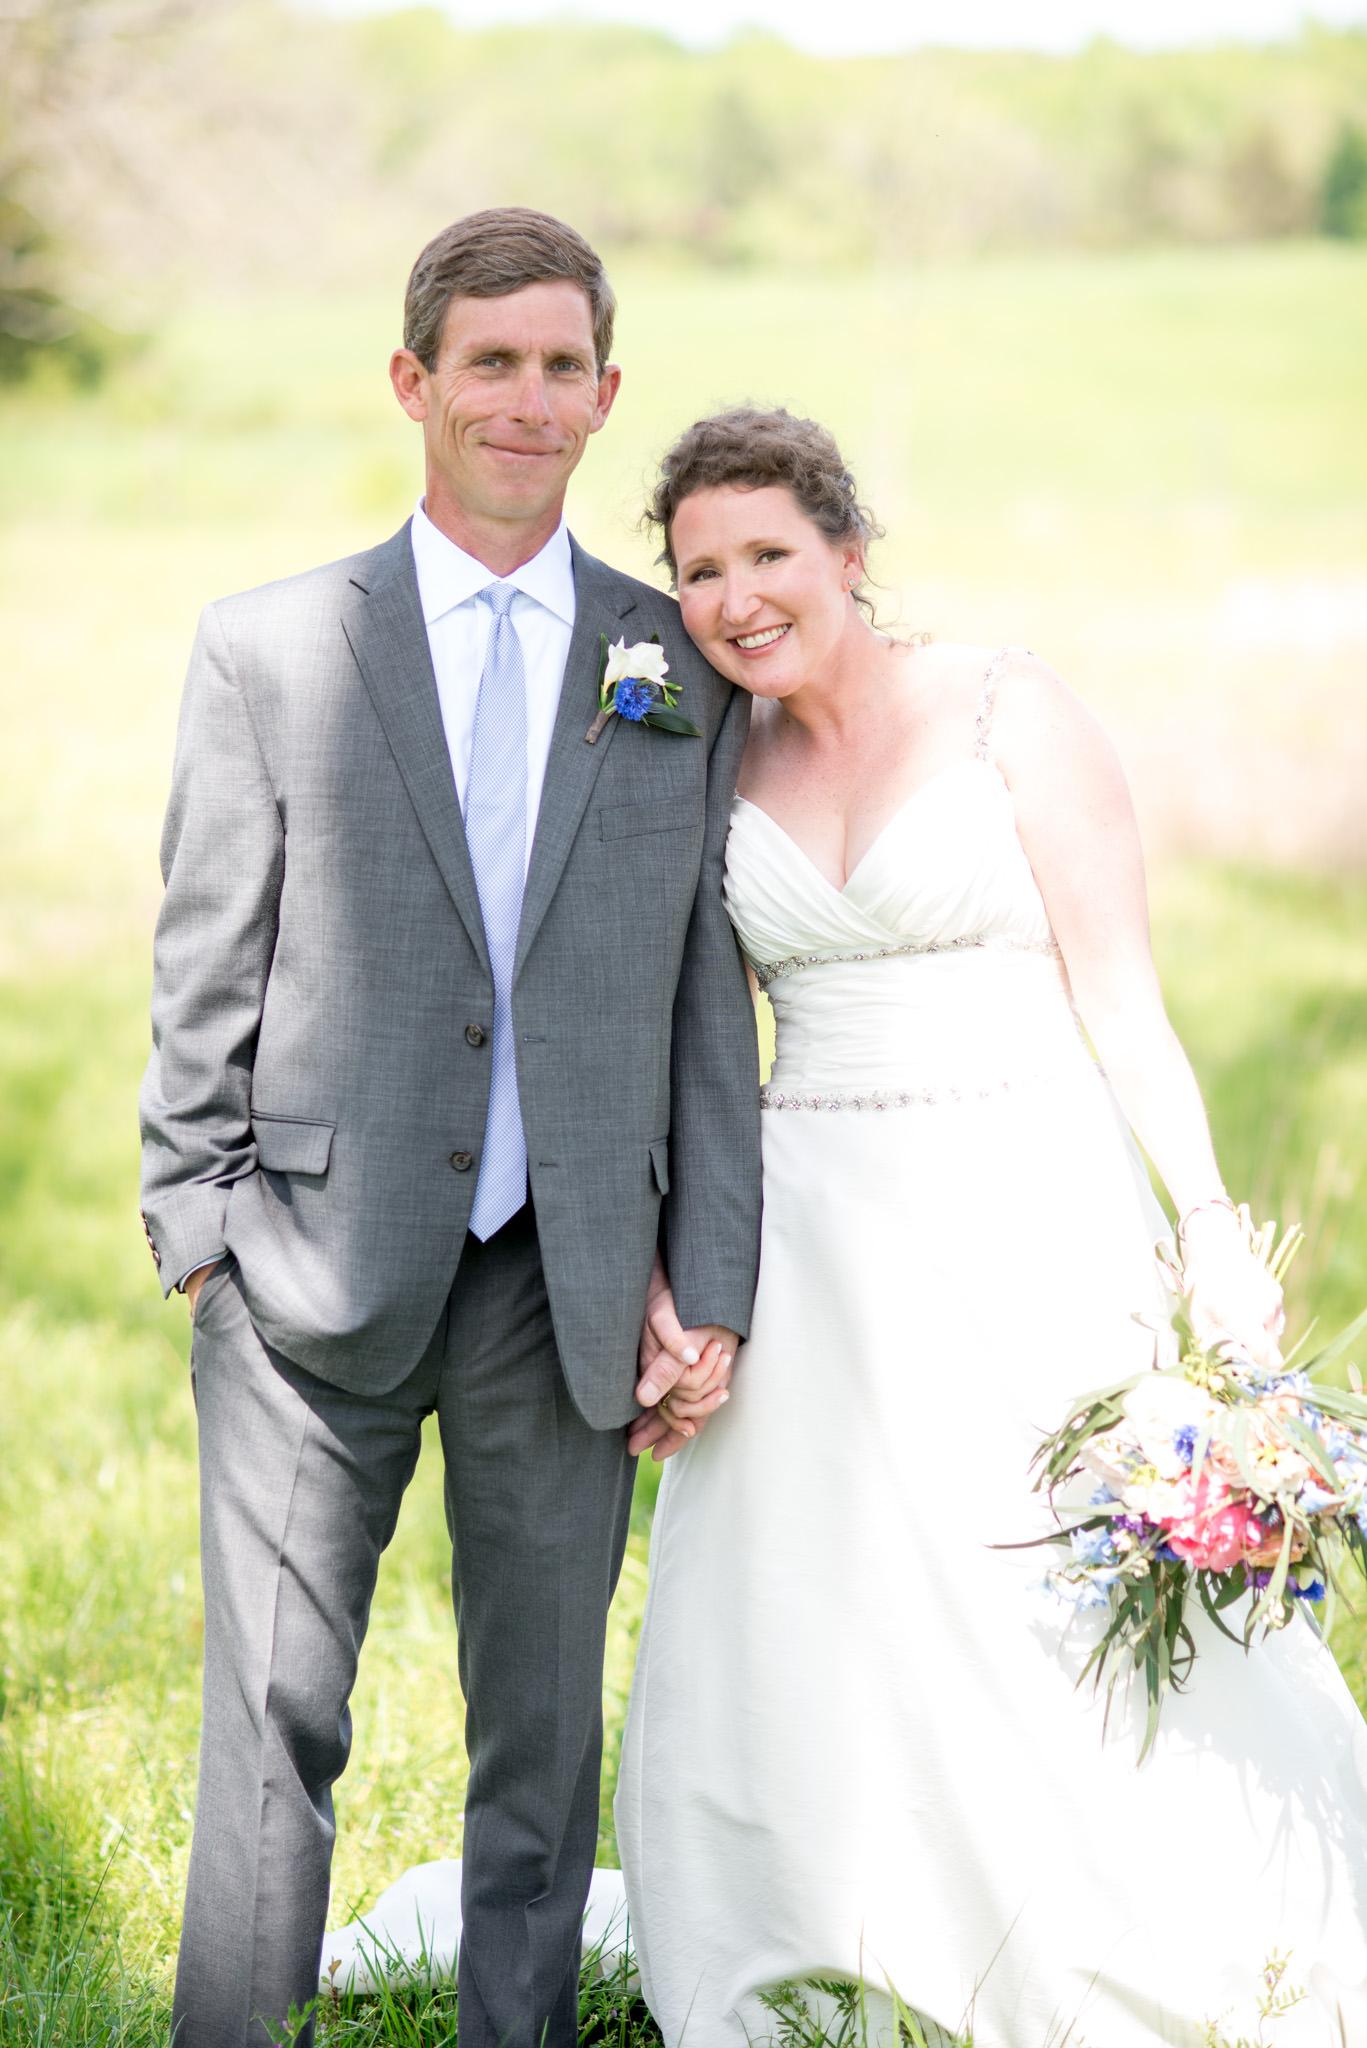 athens-ga-wedding-photographer-14.jpg